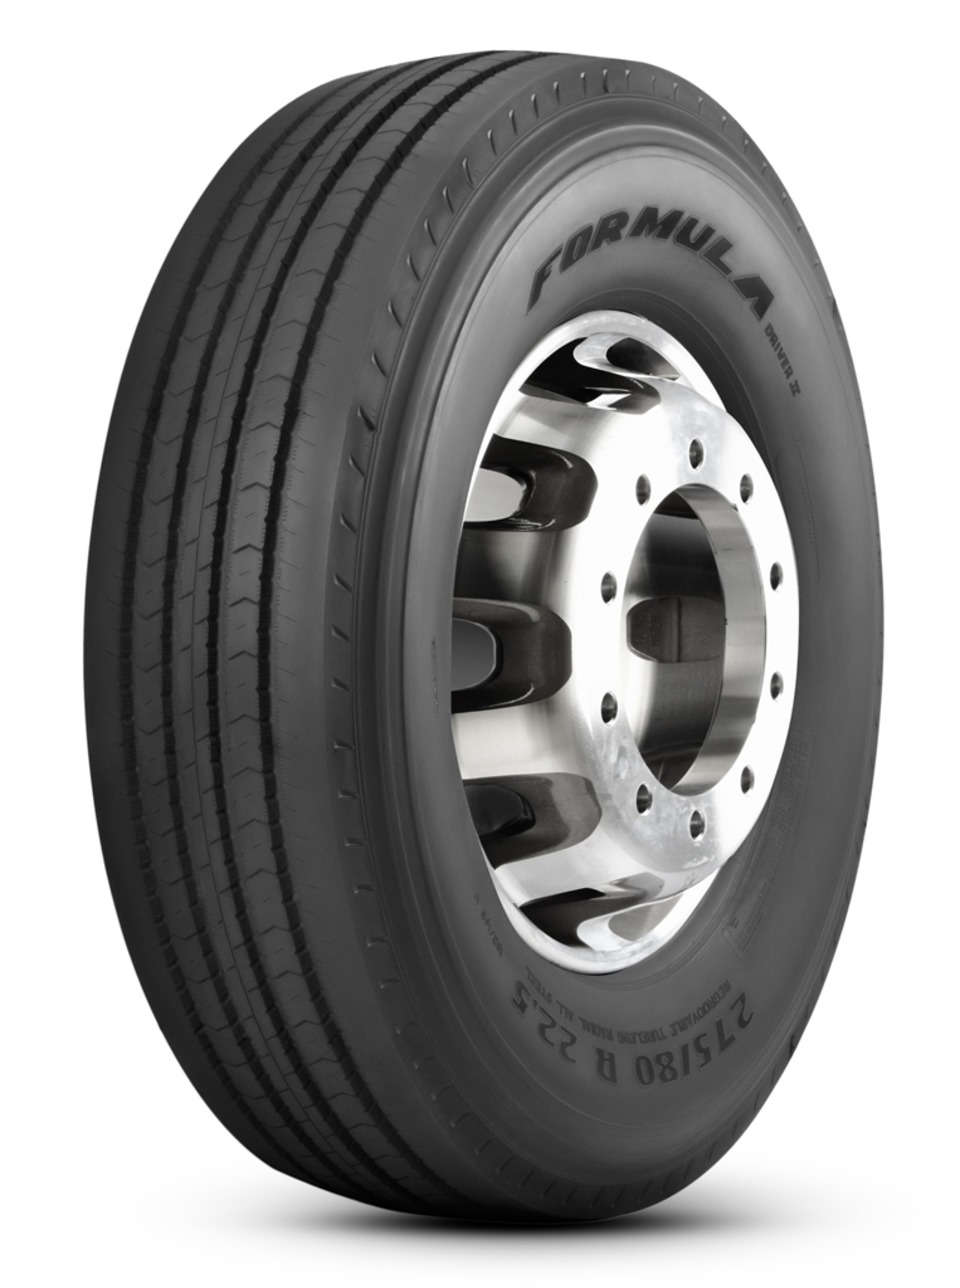 Pirelli Formula Driver Ii Tire In New Tires